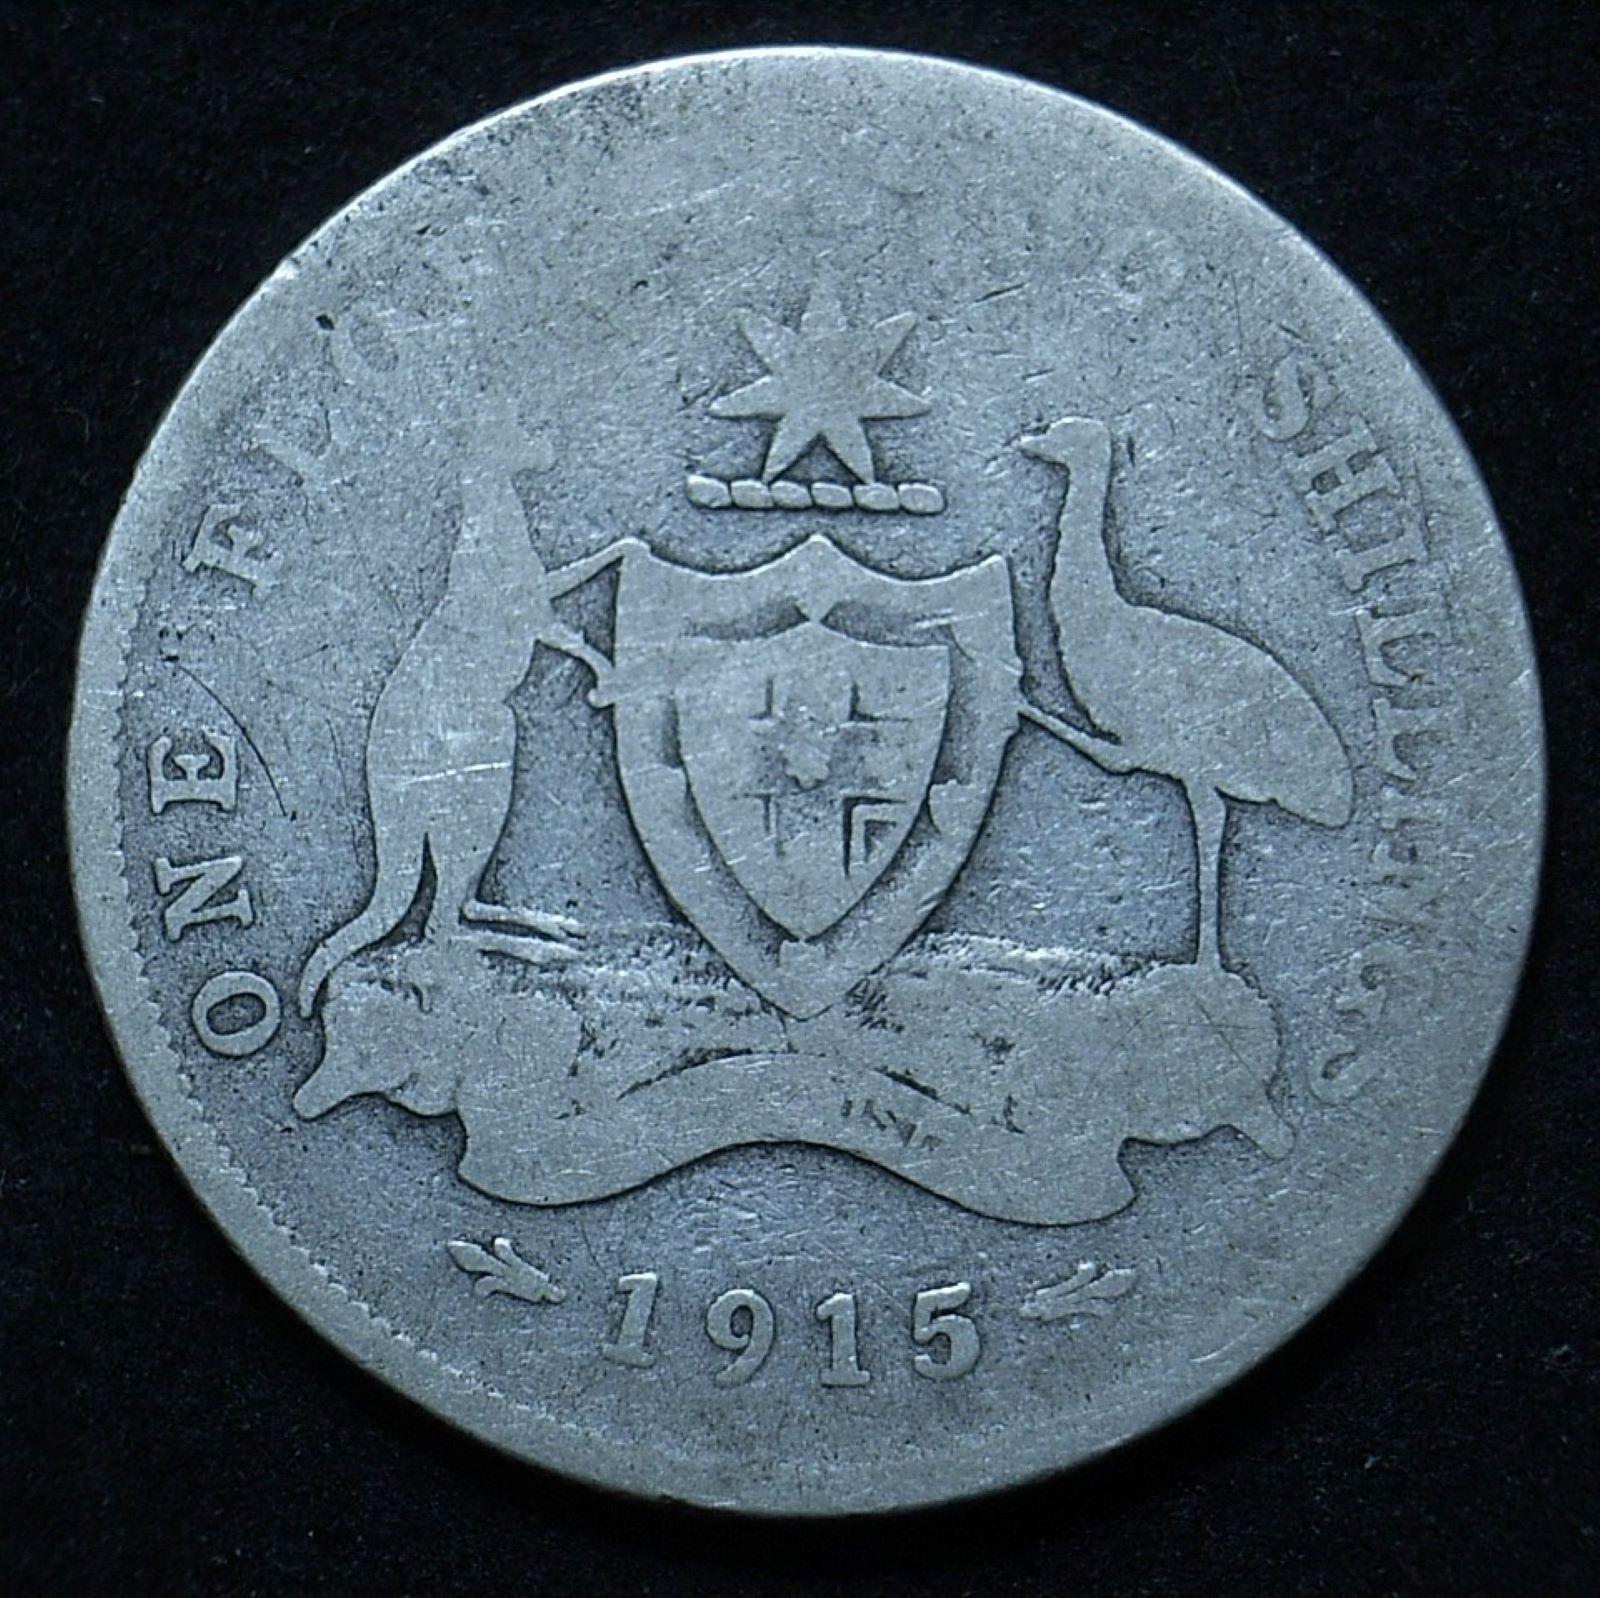 aus-florin-1915-rev-1-avg